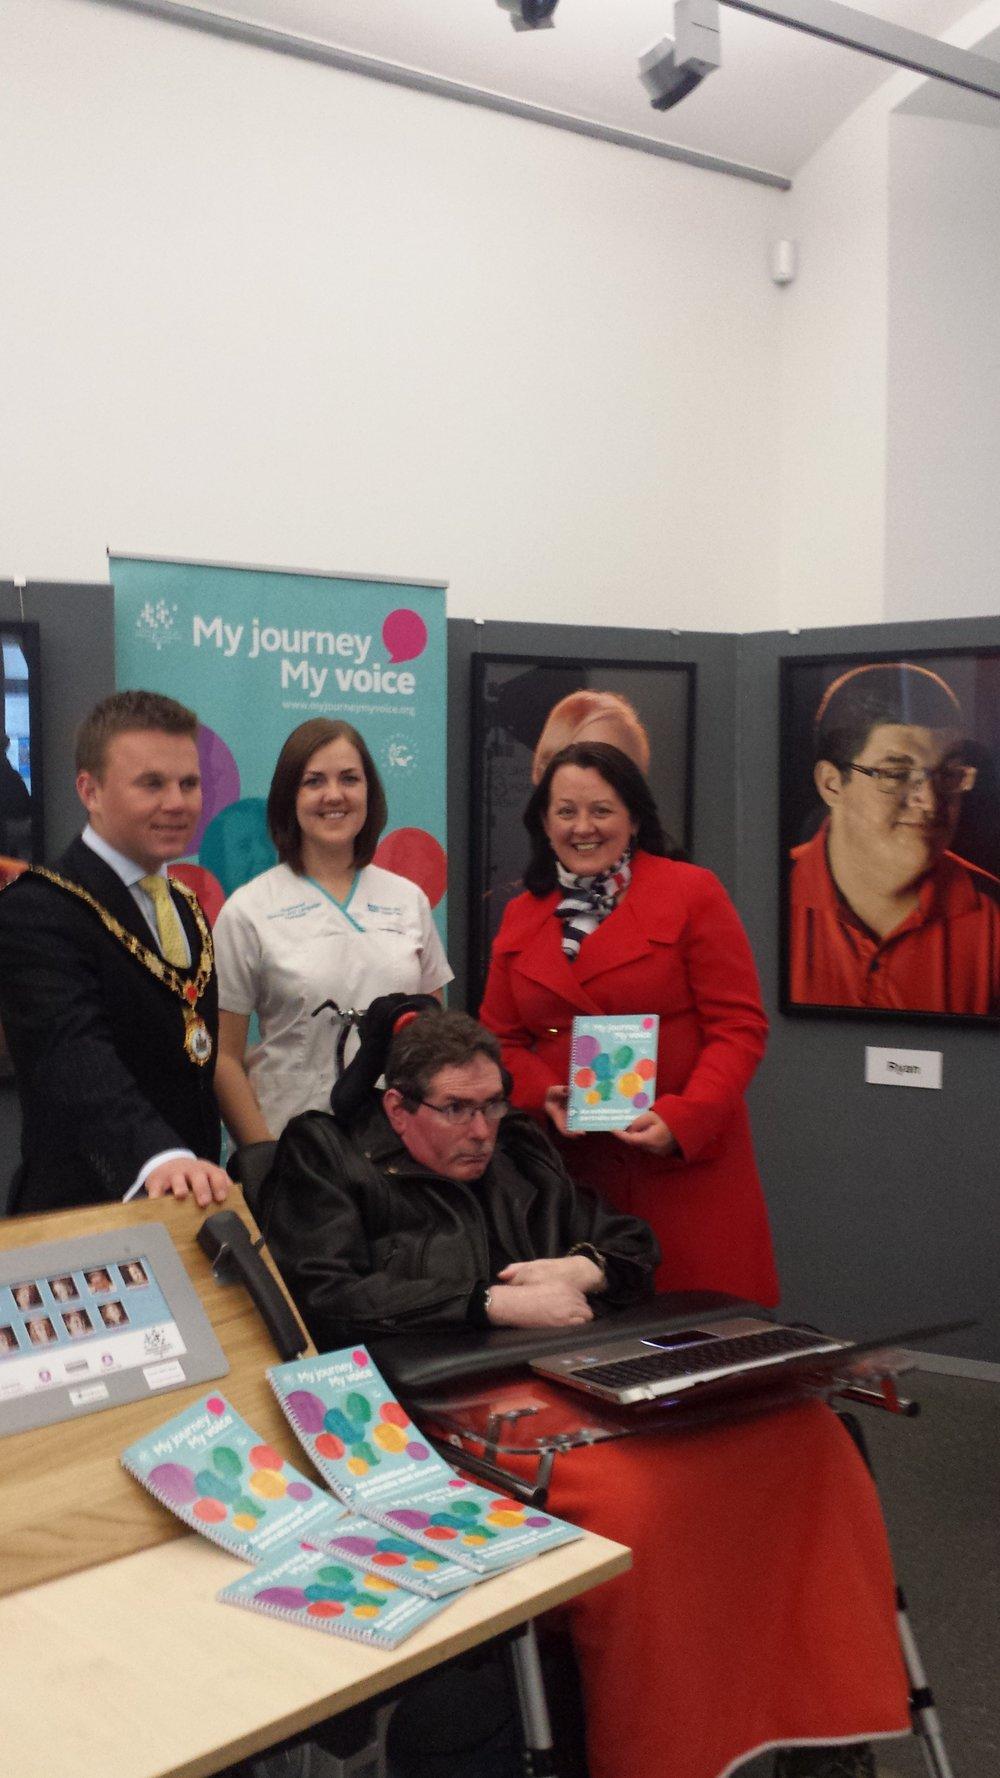 Neill with Paula Bradley MLA, Thomas Hogg, formerly Mayor of Antrim and Newtonabbey and Cathey Magee SLT